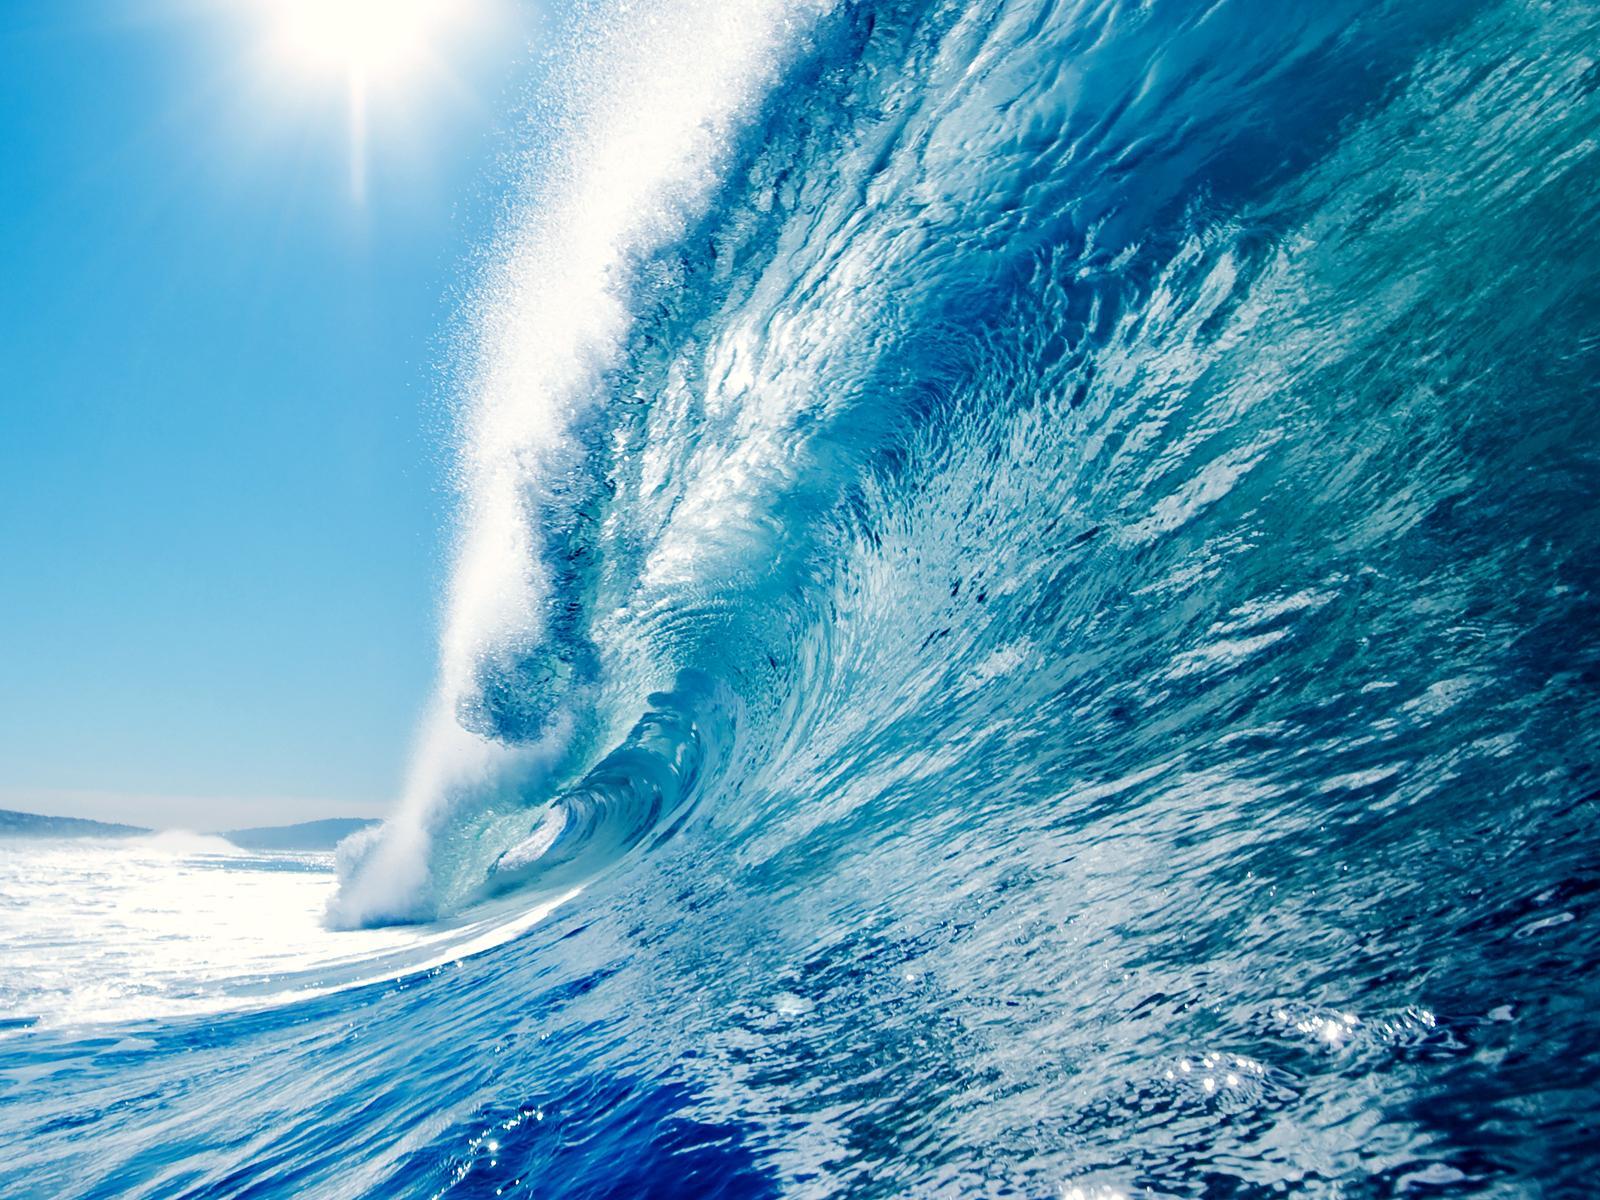 wave wallpaper - sf wallpaper